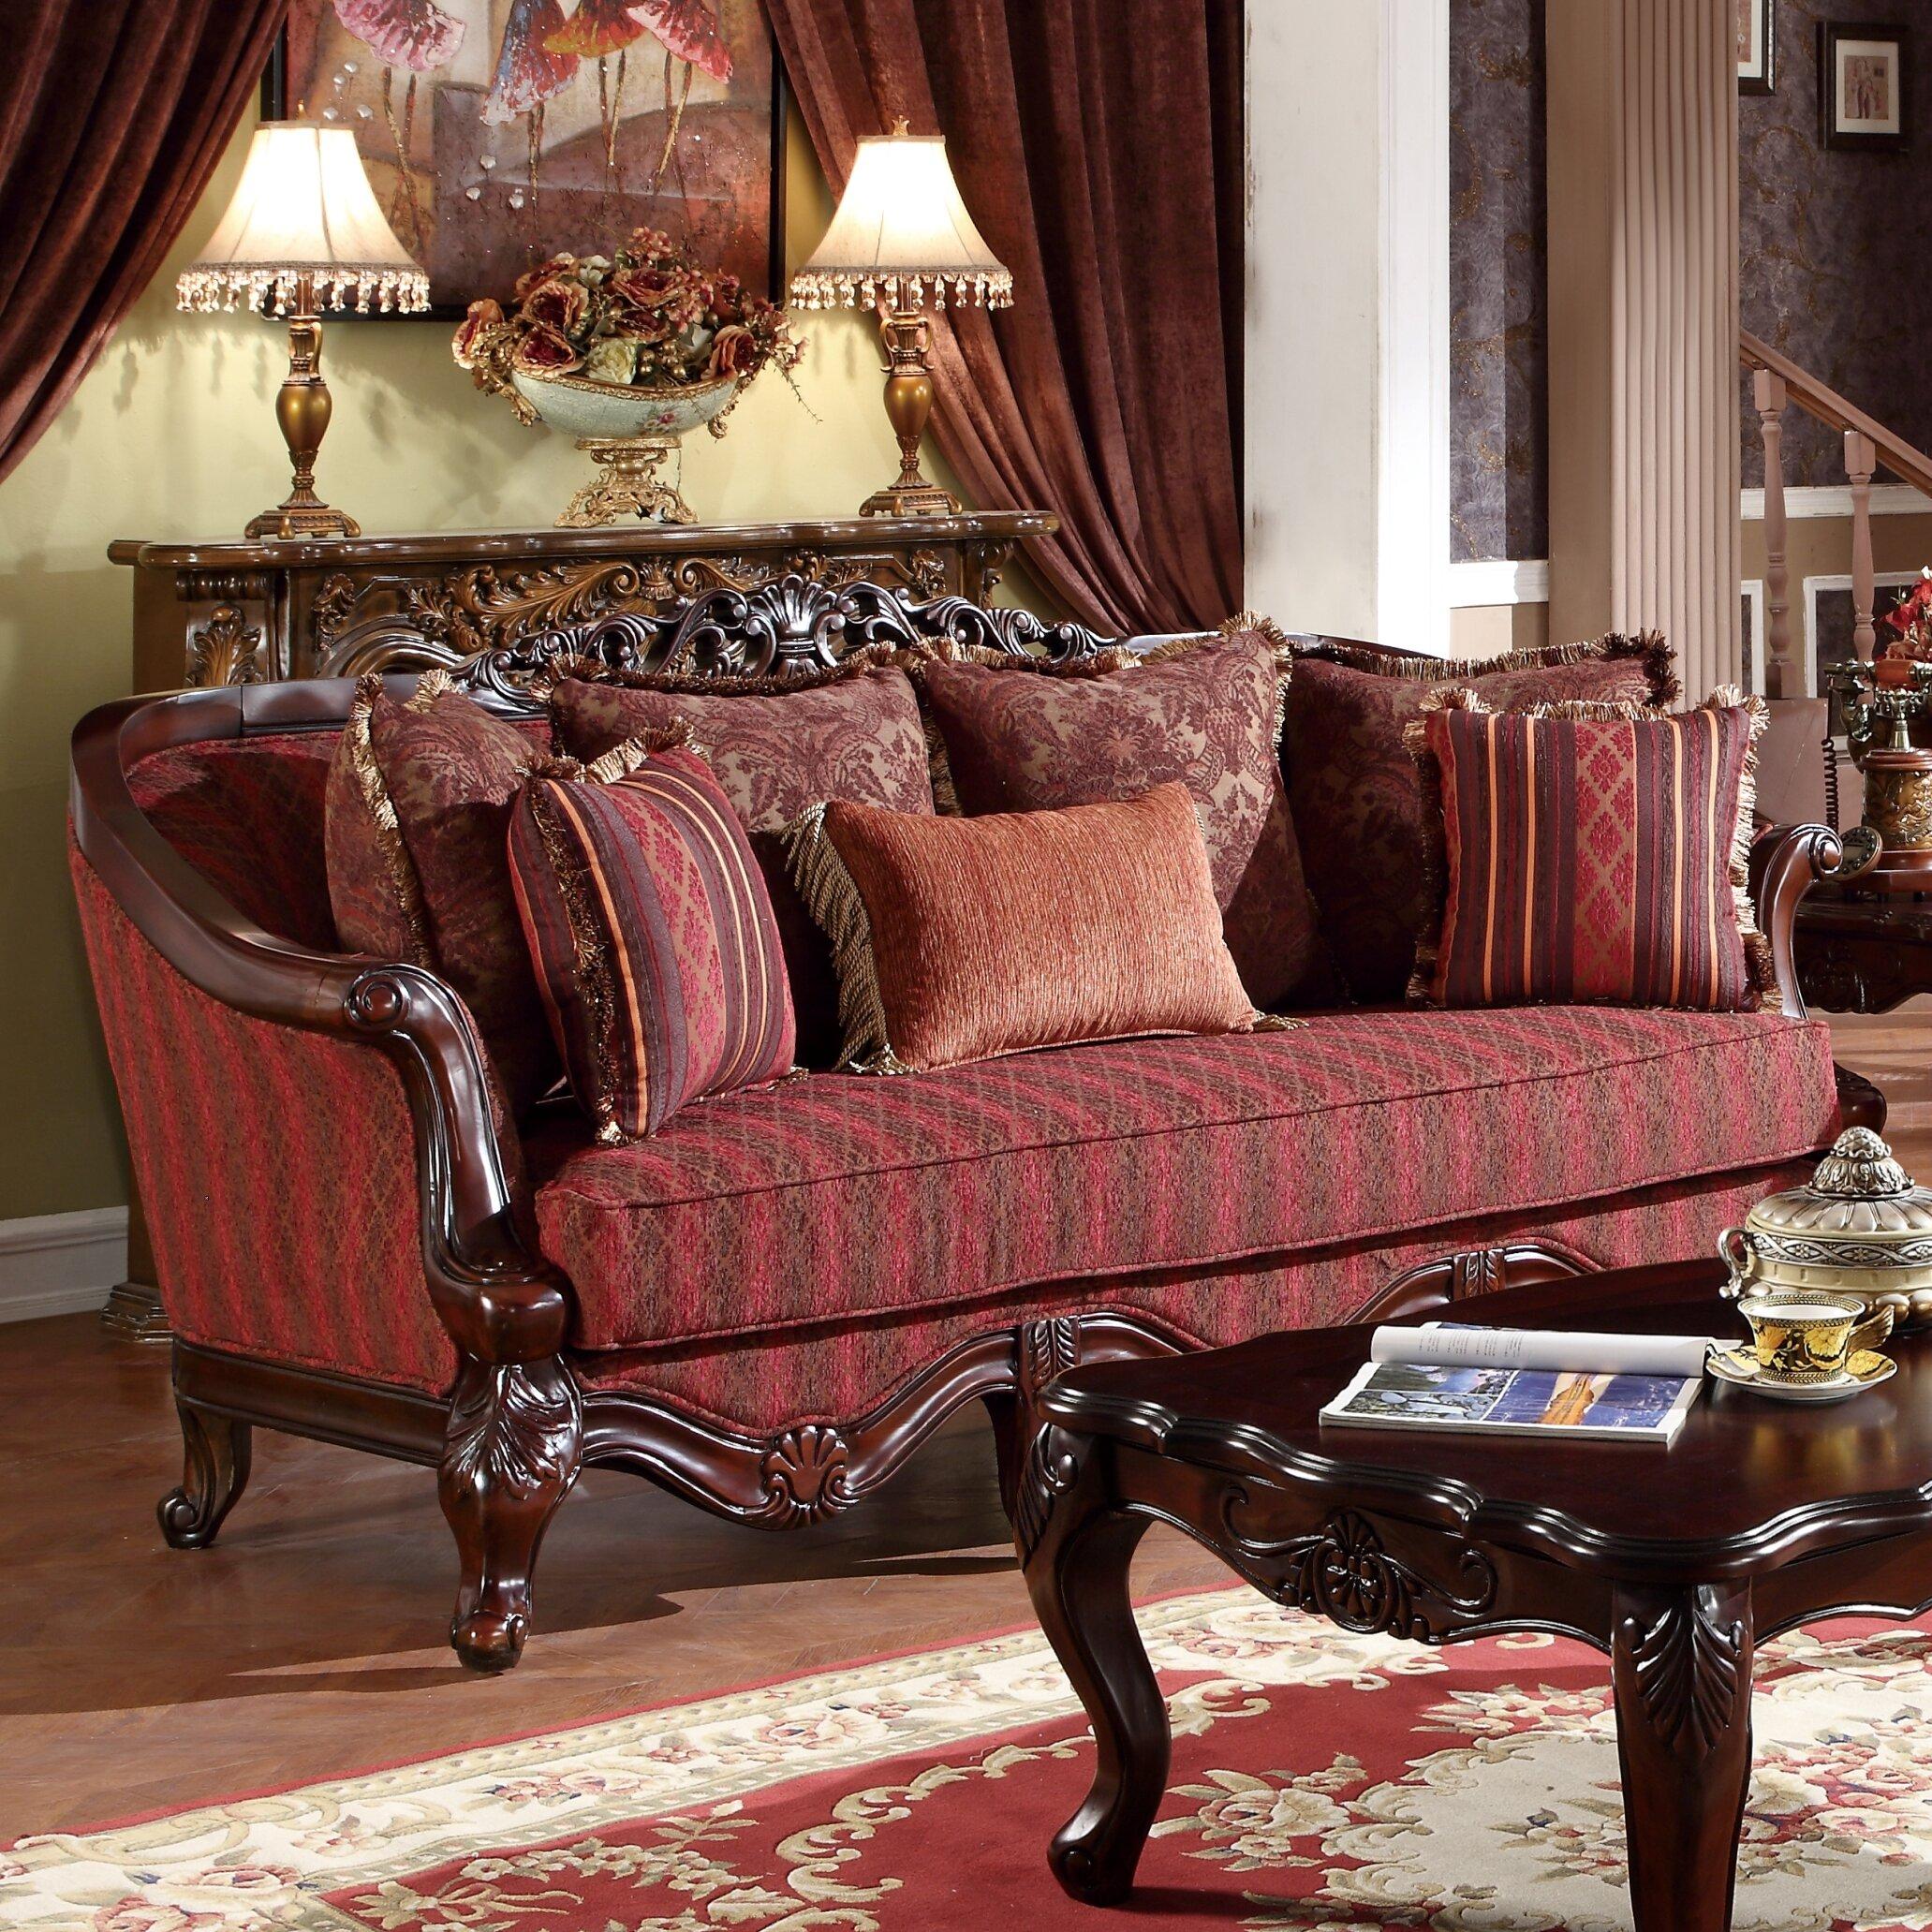 Global furniture usa sofa reviews wayfair for J furniture usa reviews